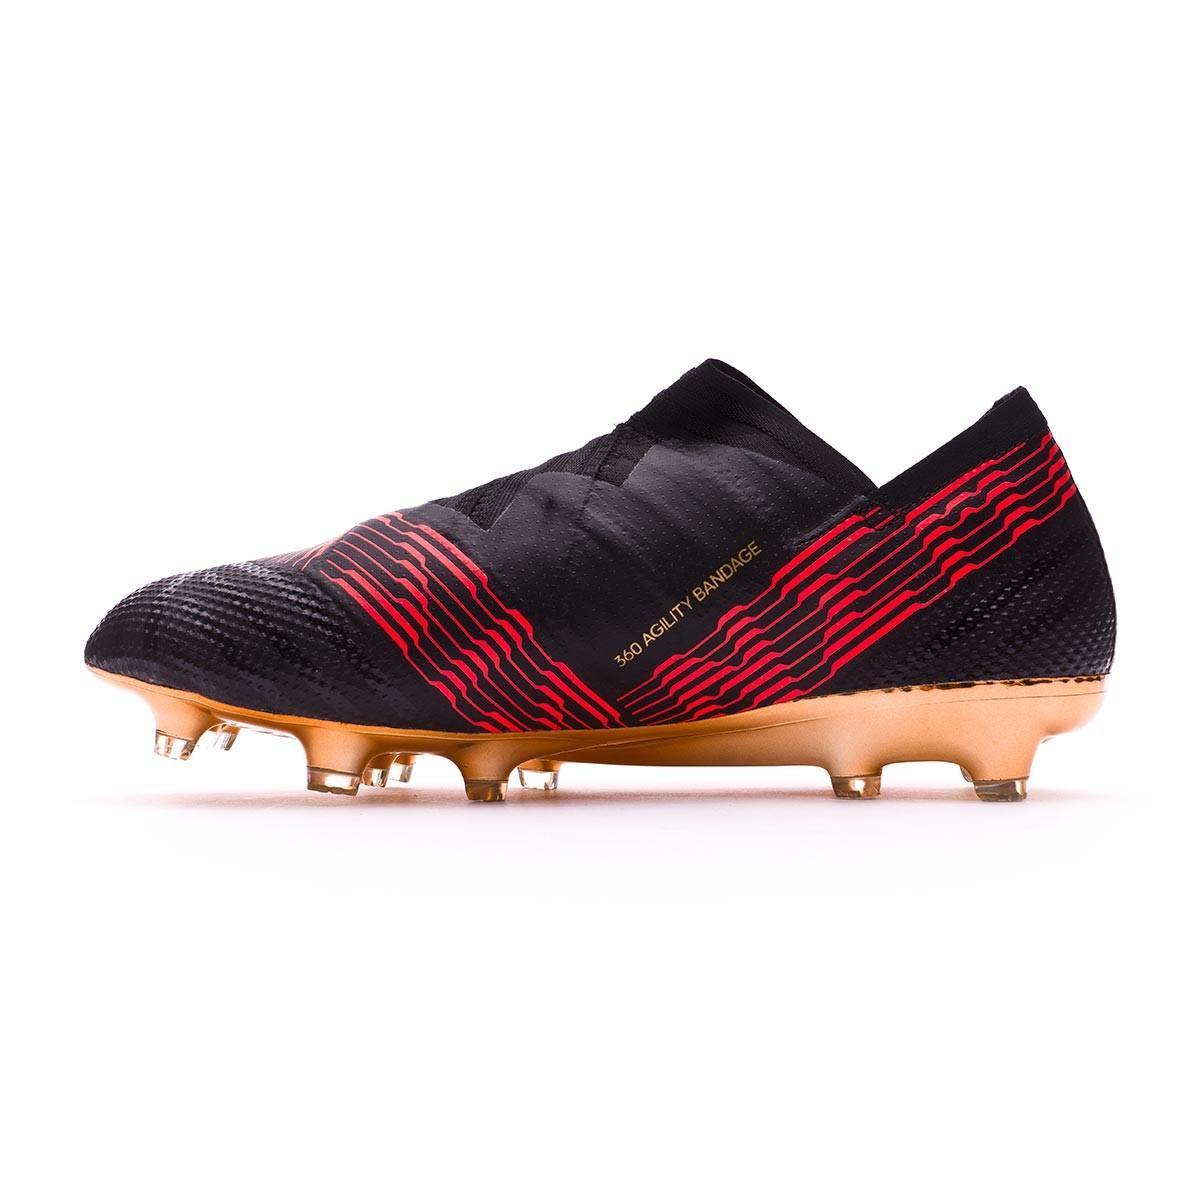 a209e1236 Football Boots adidas Nemeziz 17+ 360 Agility FG Core black-Solar red -  Football store Fútbol Emotion